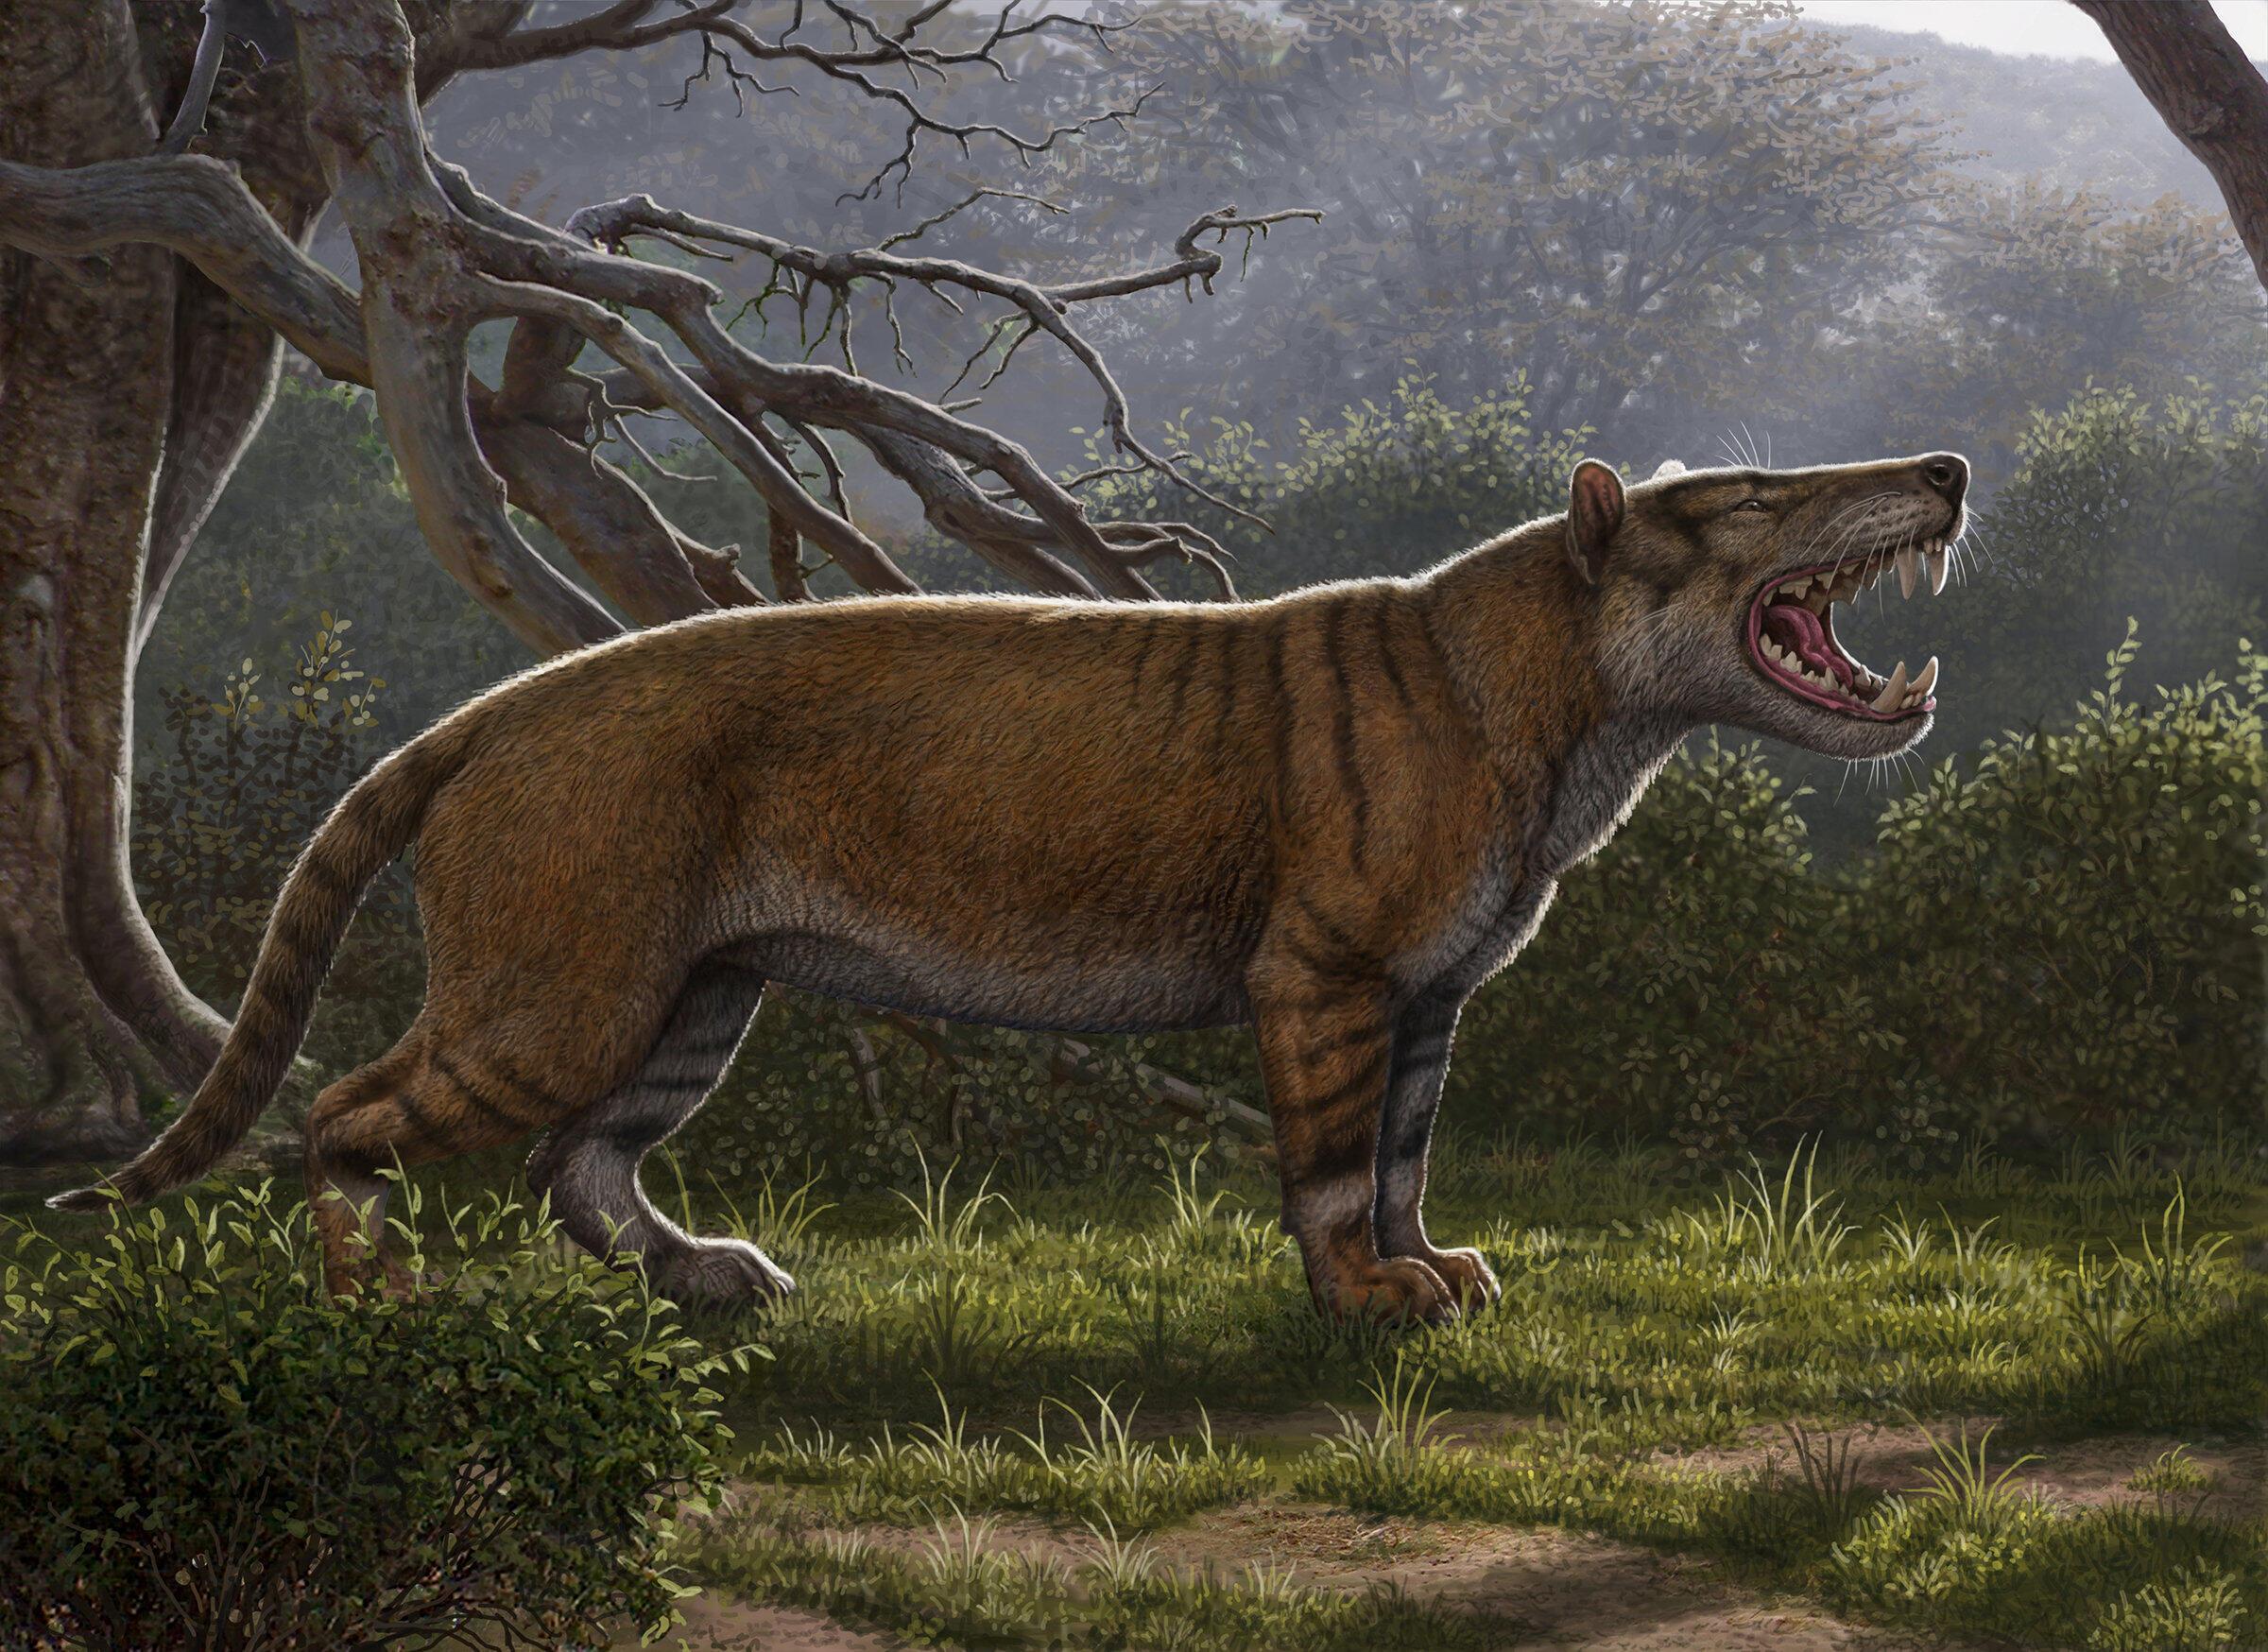 Ilustración del Simbakubwa kutokaafrika.